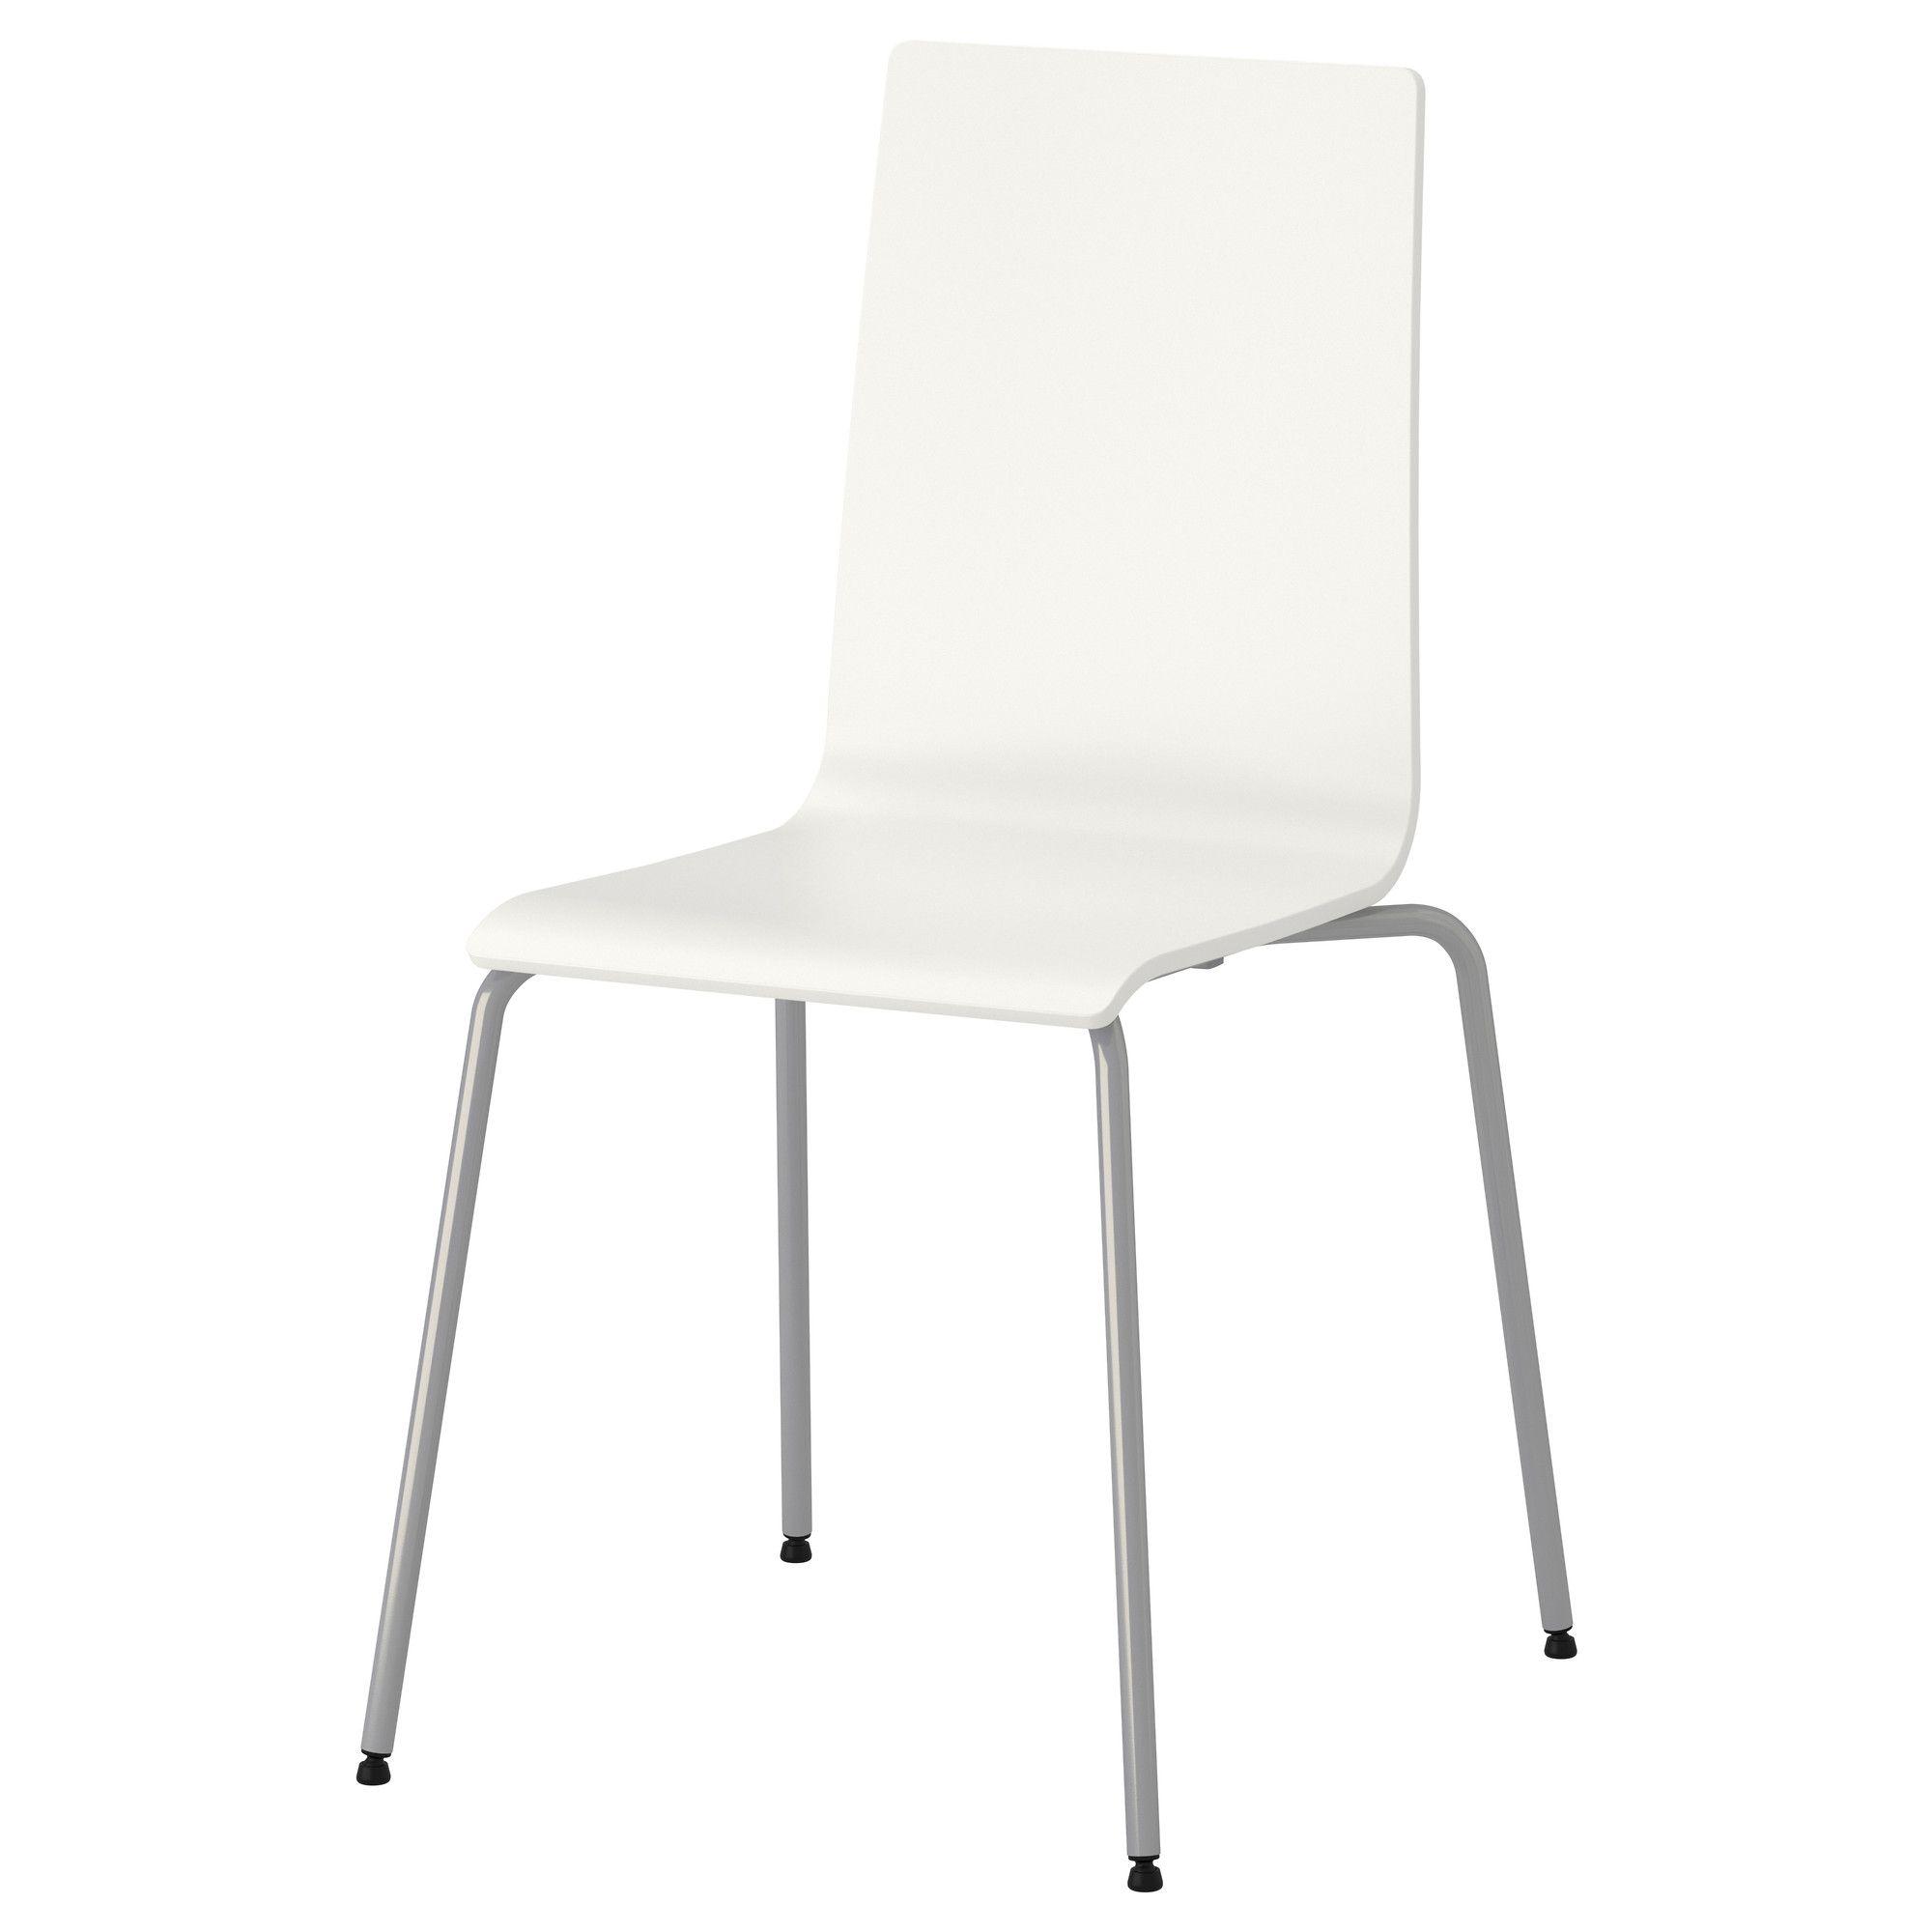 MARTIN Silla - gris plata/blanco - IKEA | Ikea *** | Pinterest ...